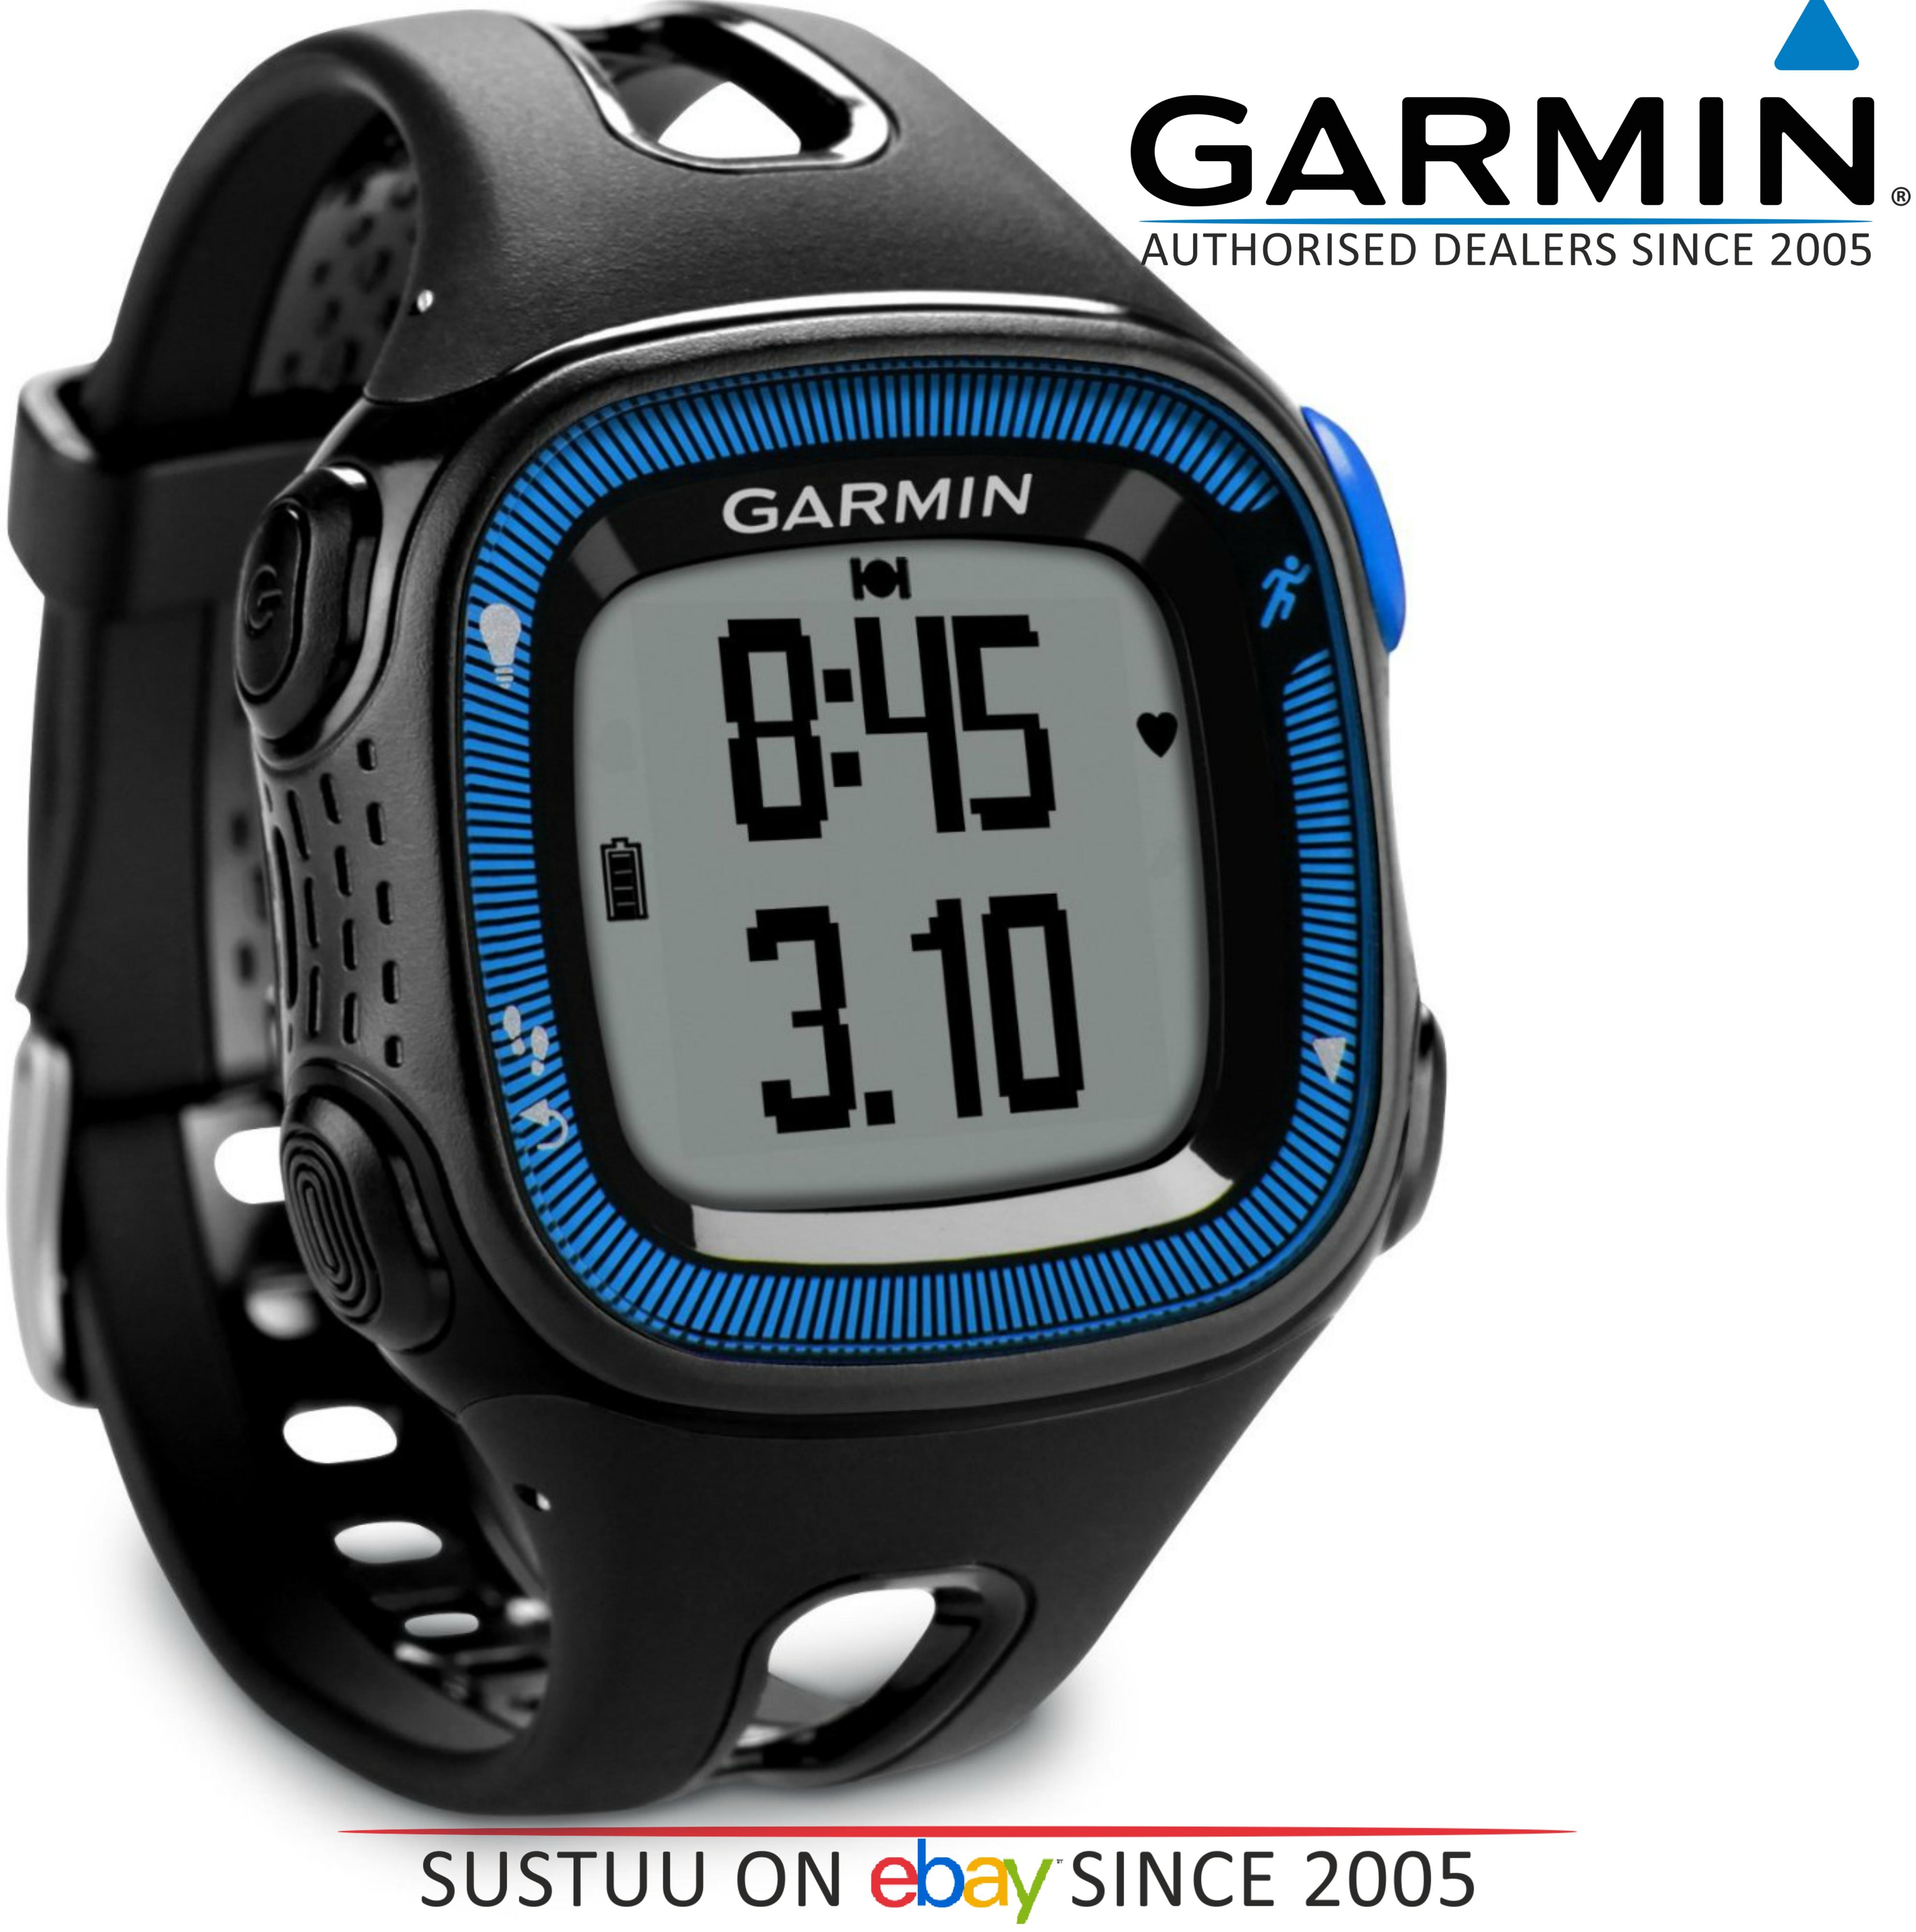 Garmin Forerunner FR15 GPS Speed & Distance Sports Watch Black/Blue Large